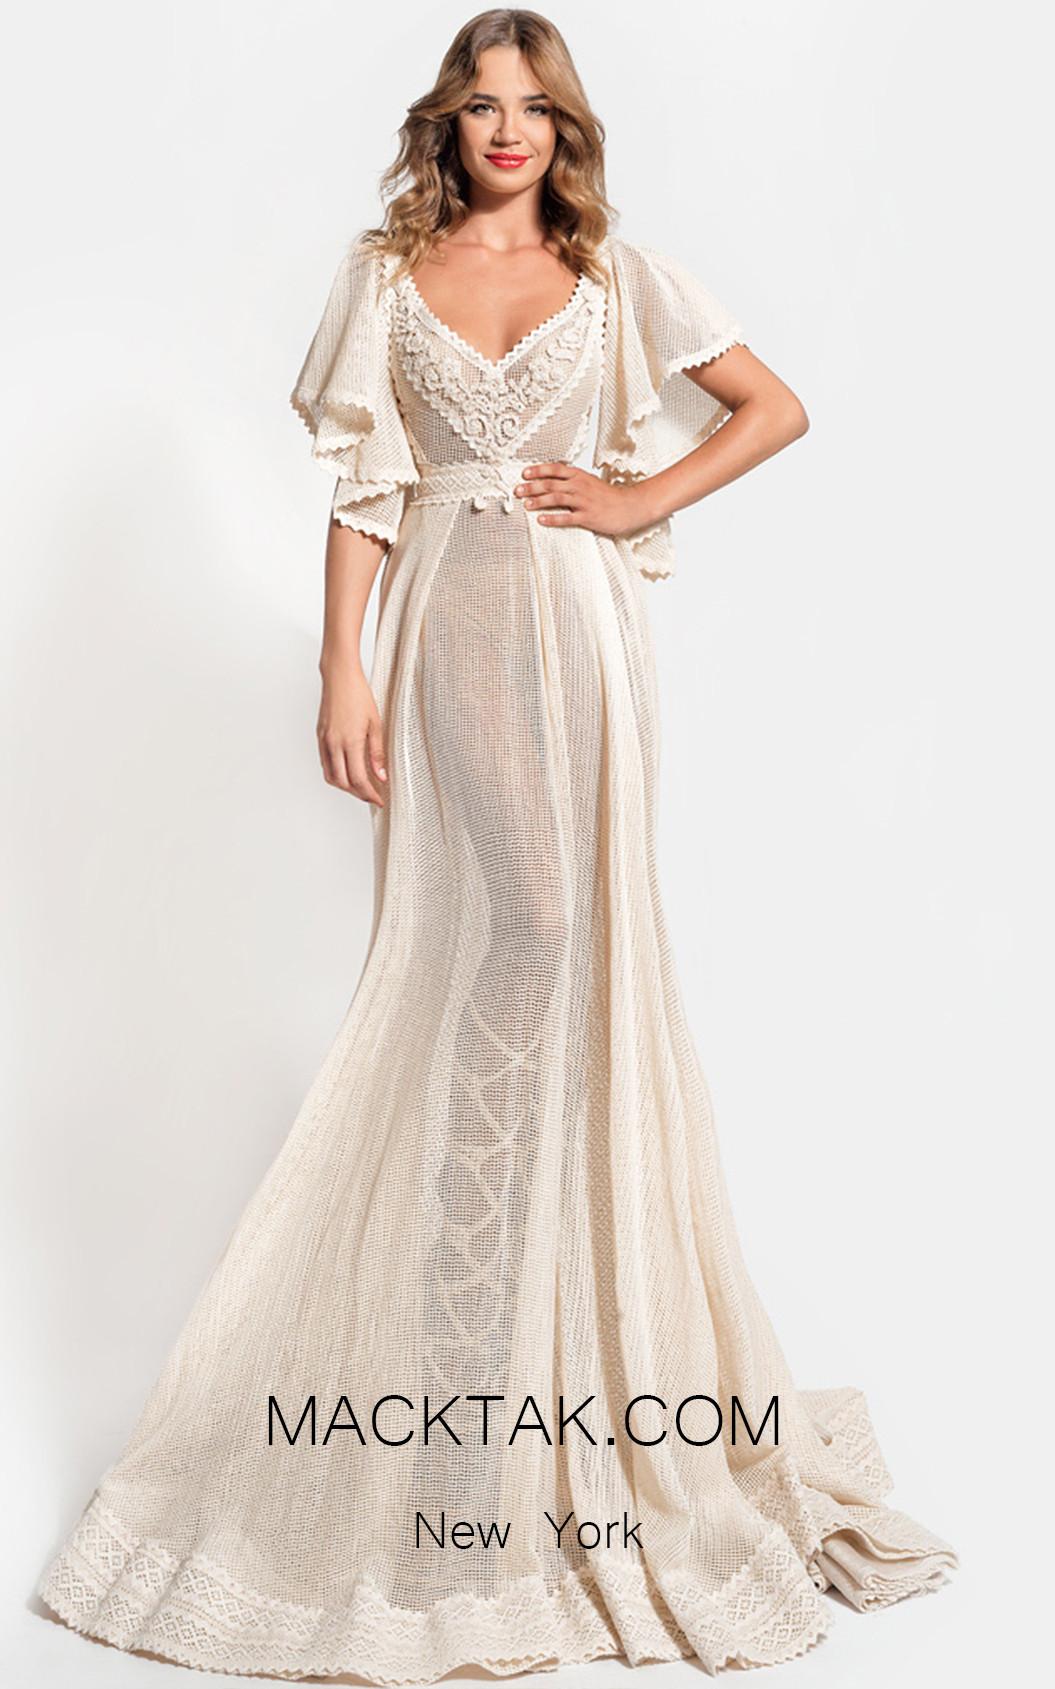 Zolotas Atelier Amalthea Front Evening Dress